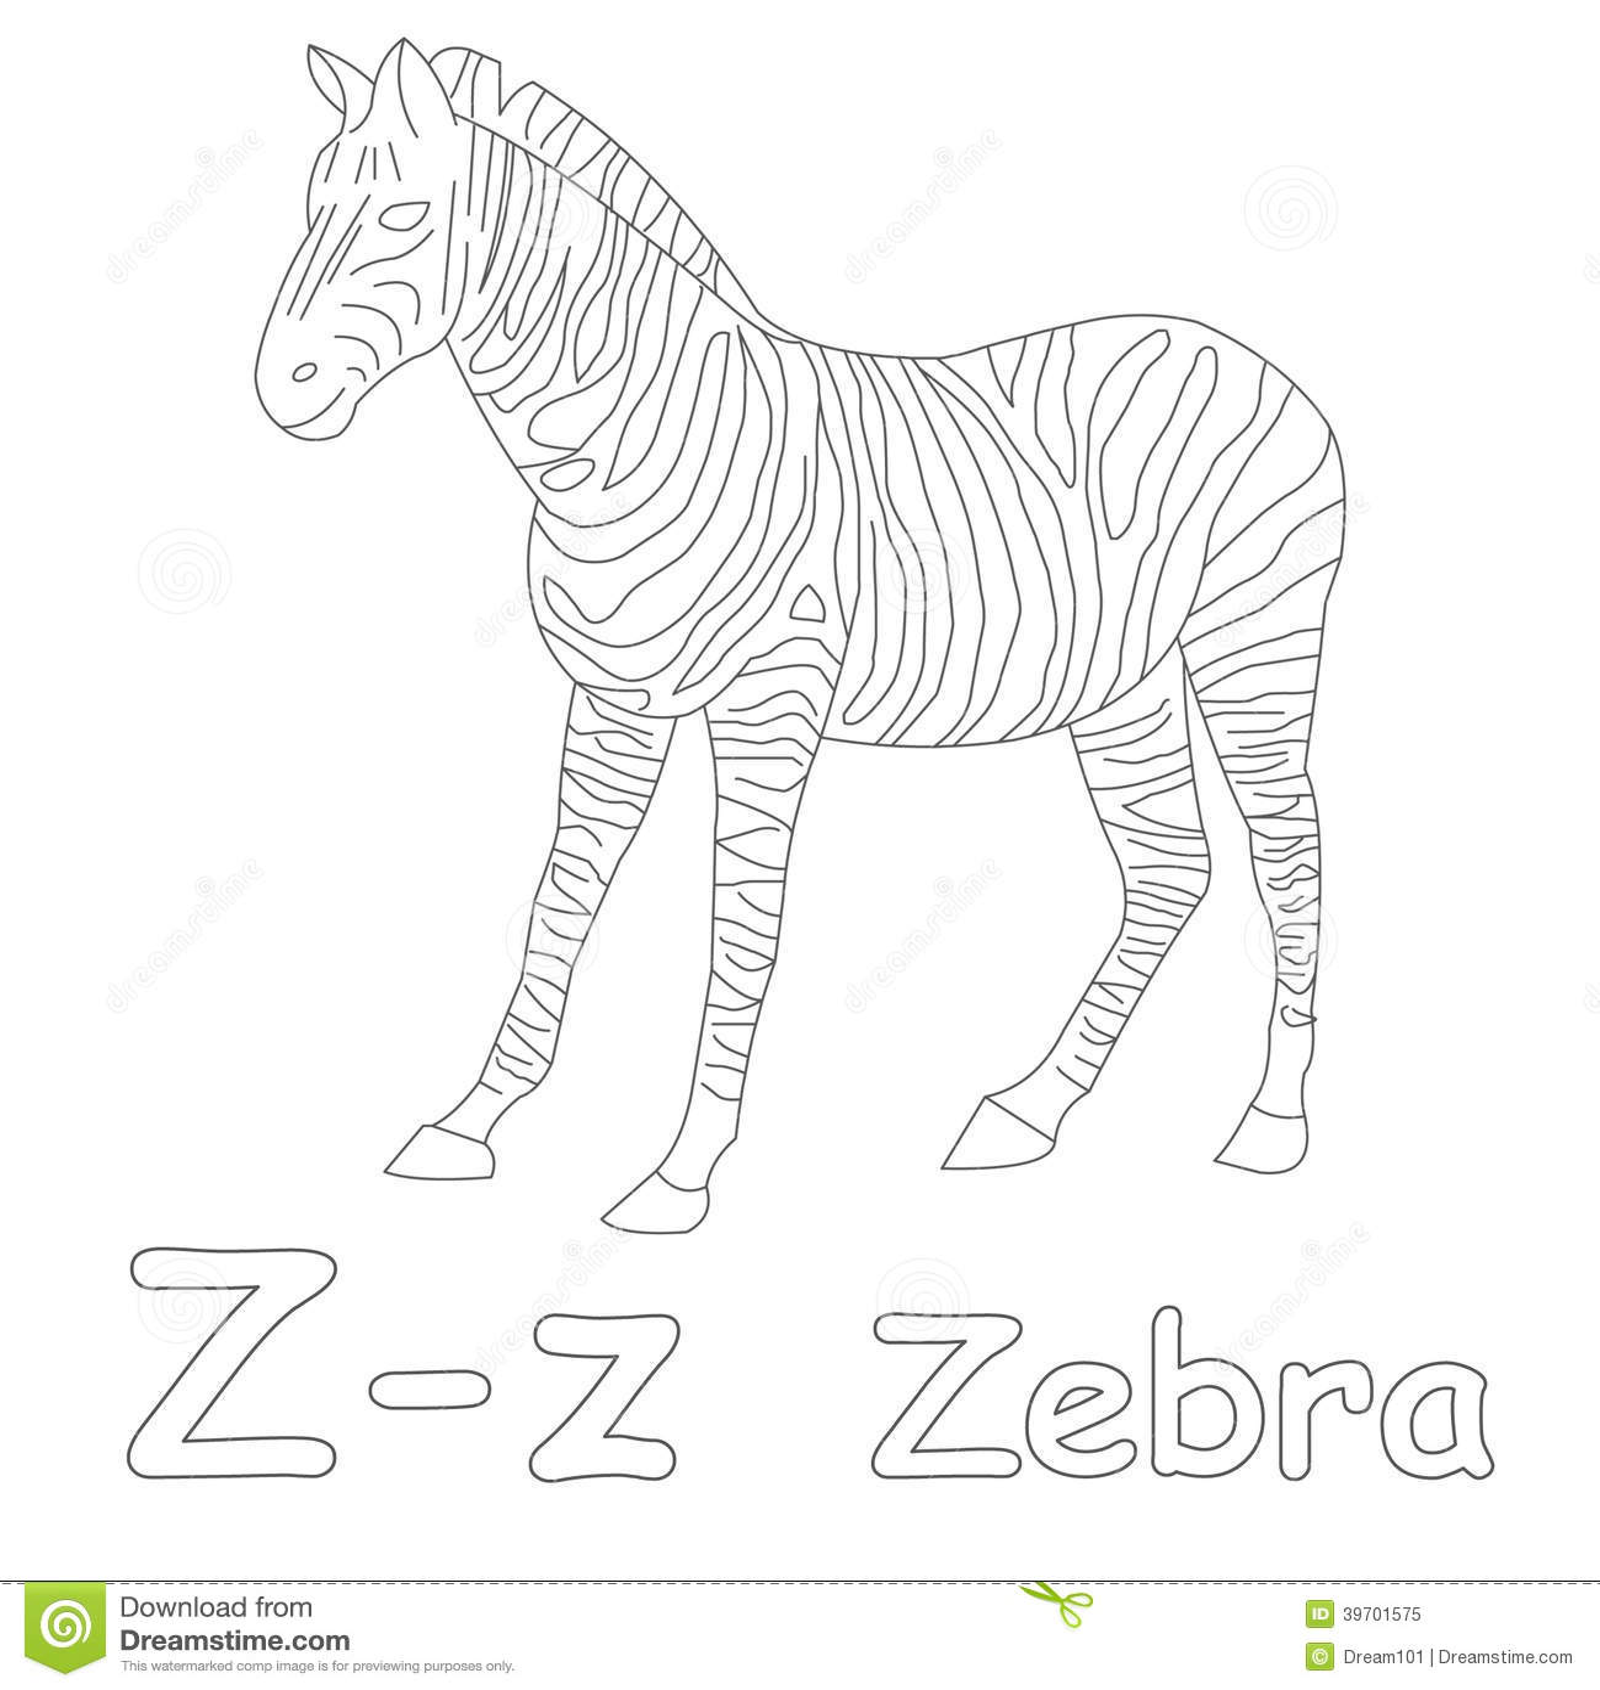 Z for Zebra Coloring Page stock illustration. Image of